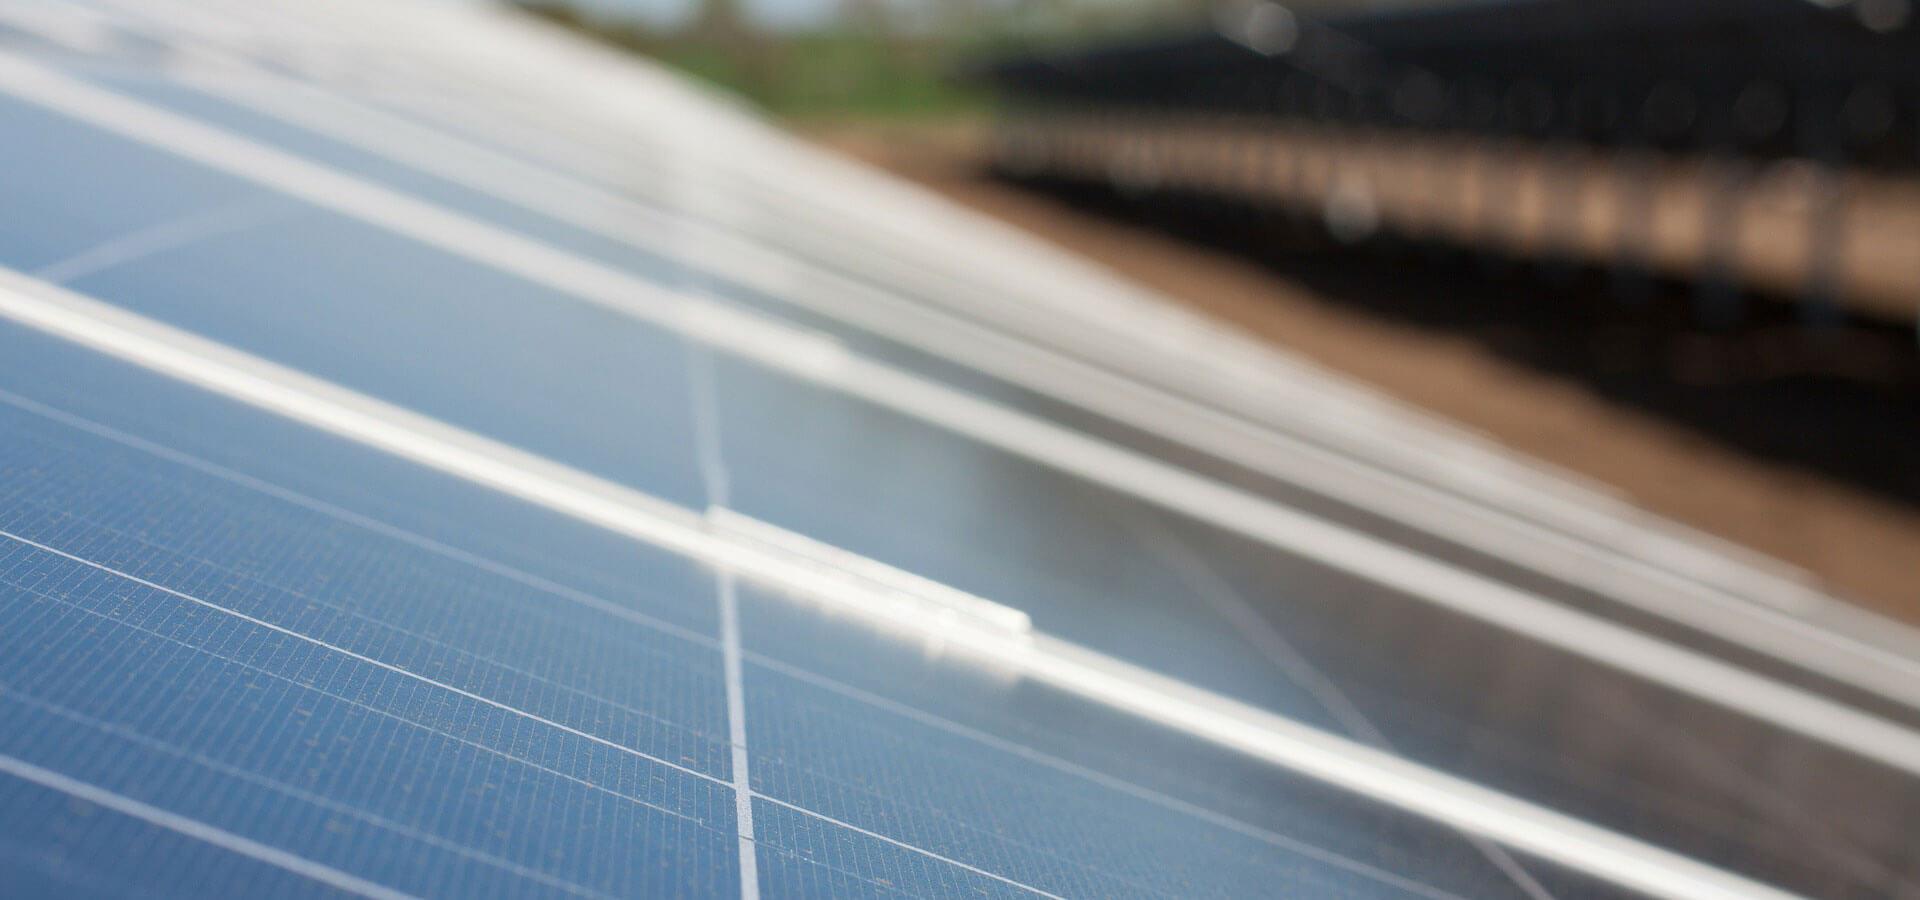 SEPA150-Solar Electric Power Assembly 150 Watt